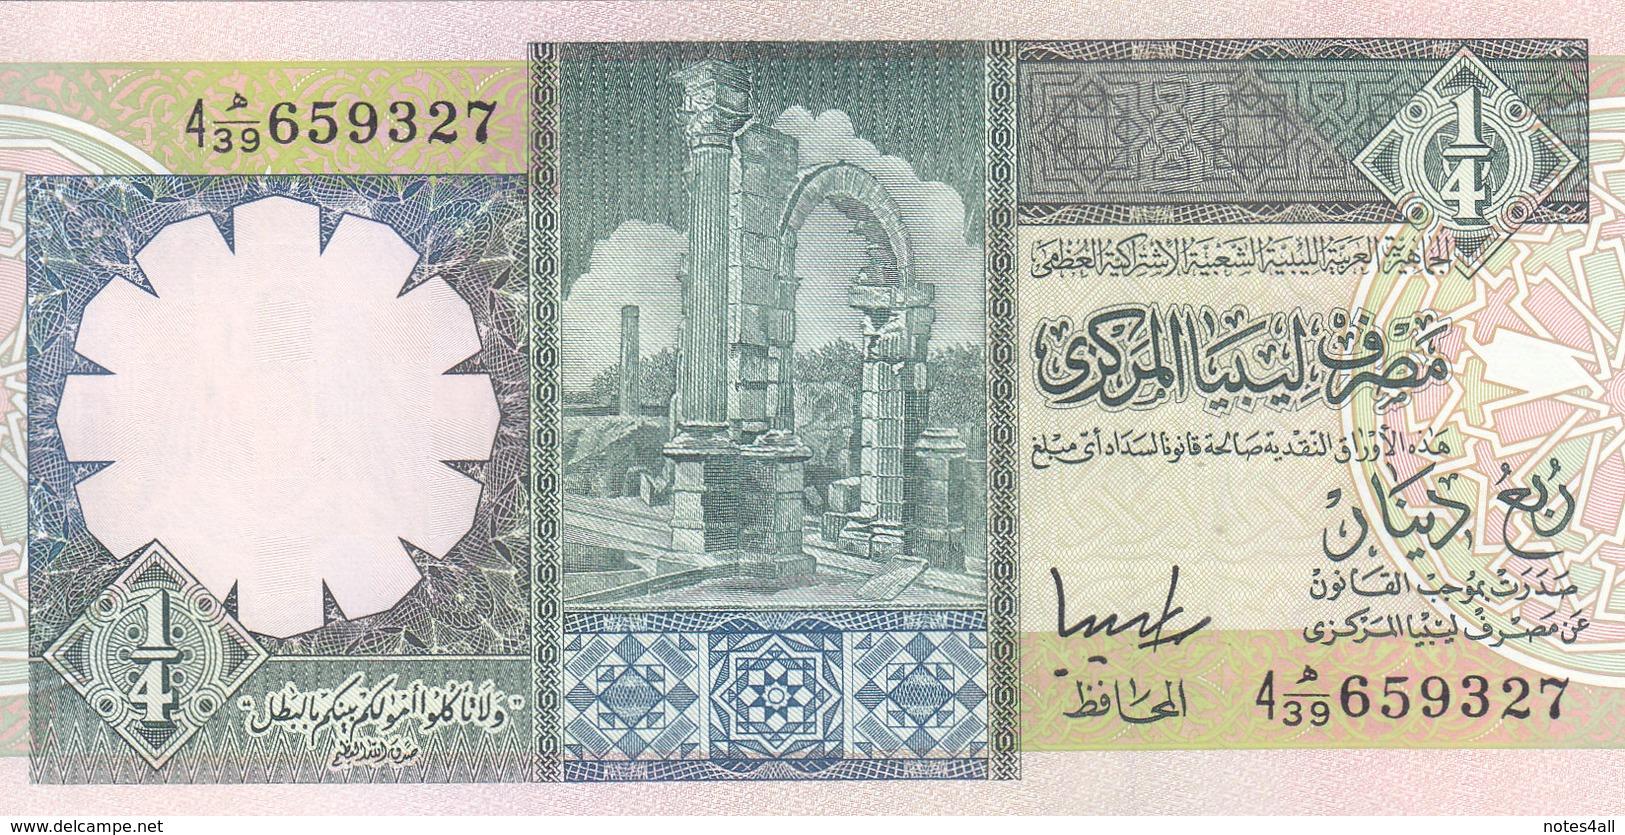 LIBYA 1/4 DINAR 1991 P-57c SIG/5 JIHIME UNC */* - Libya